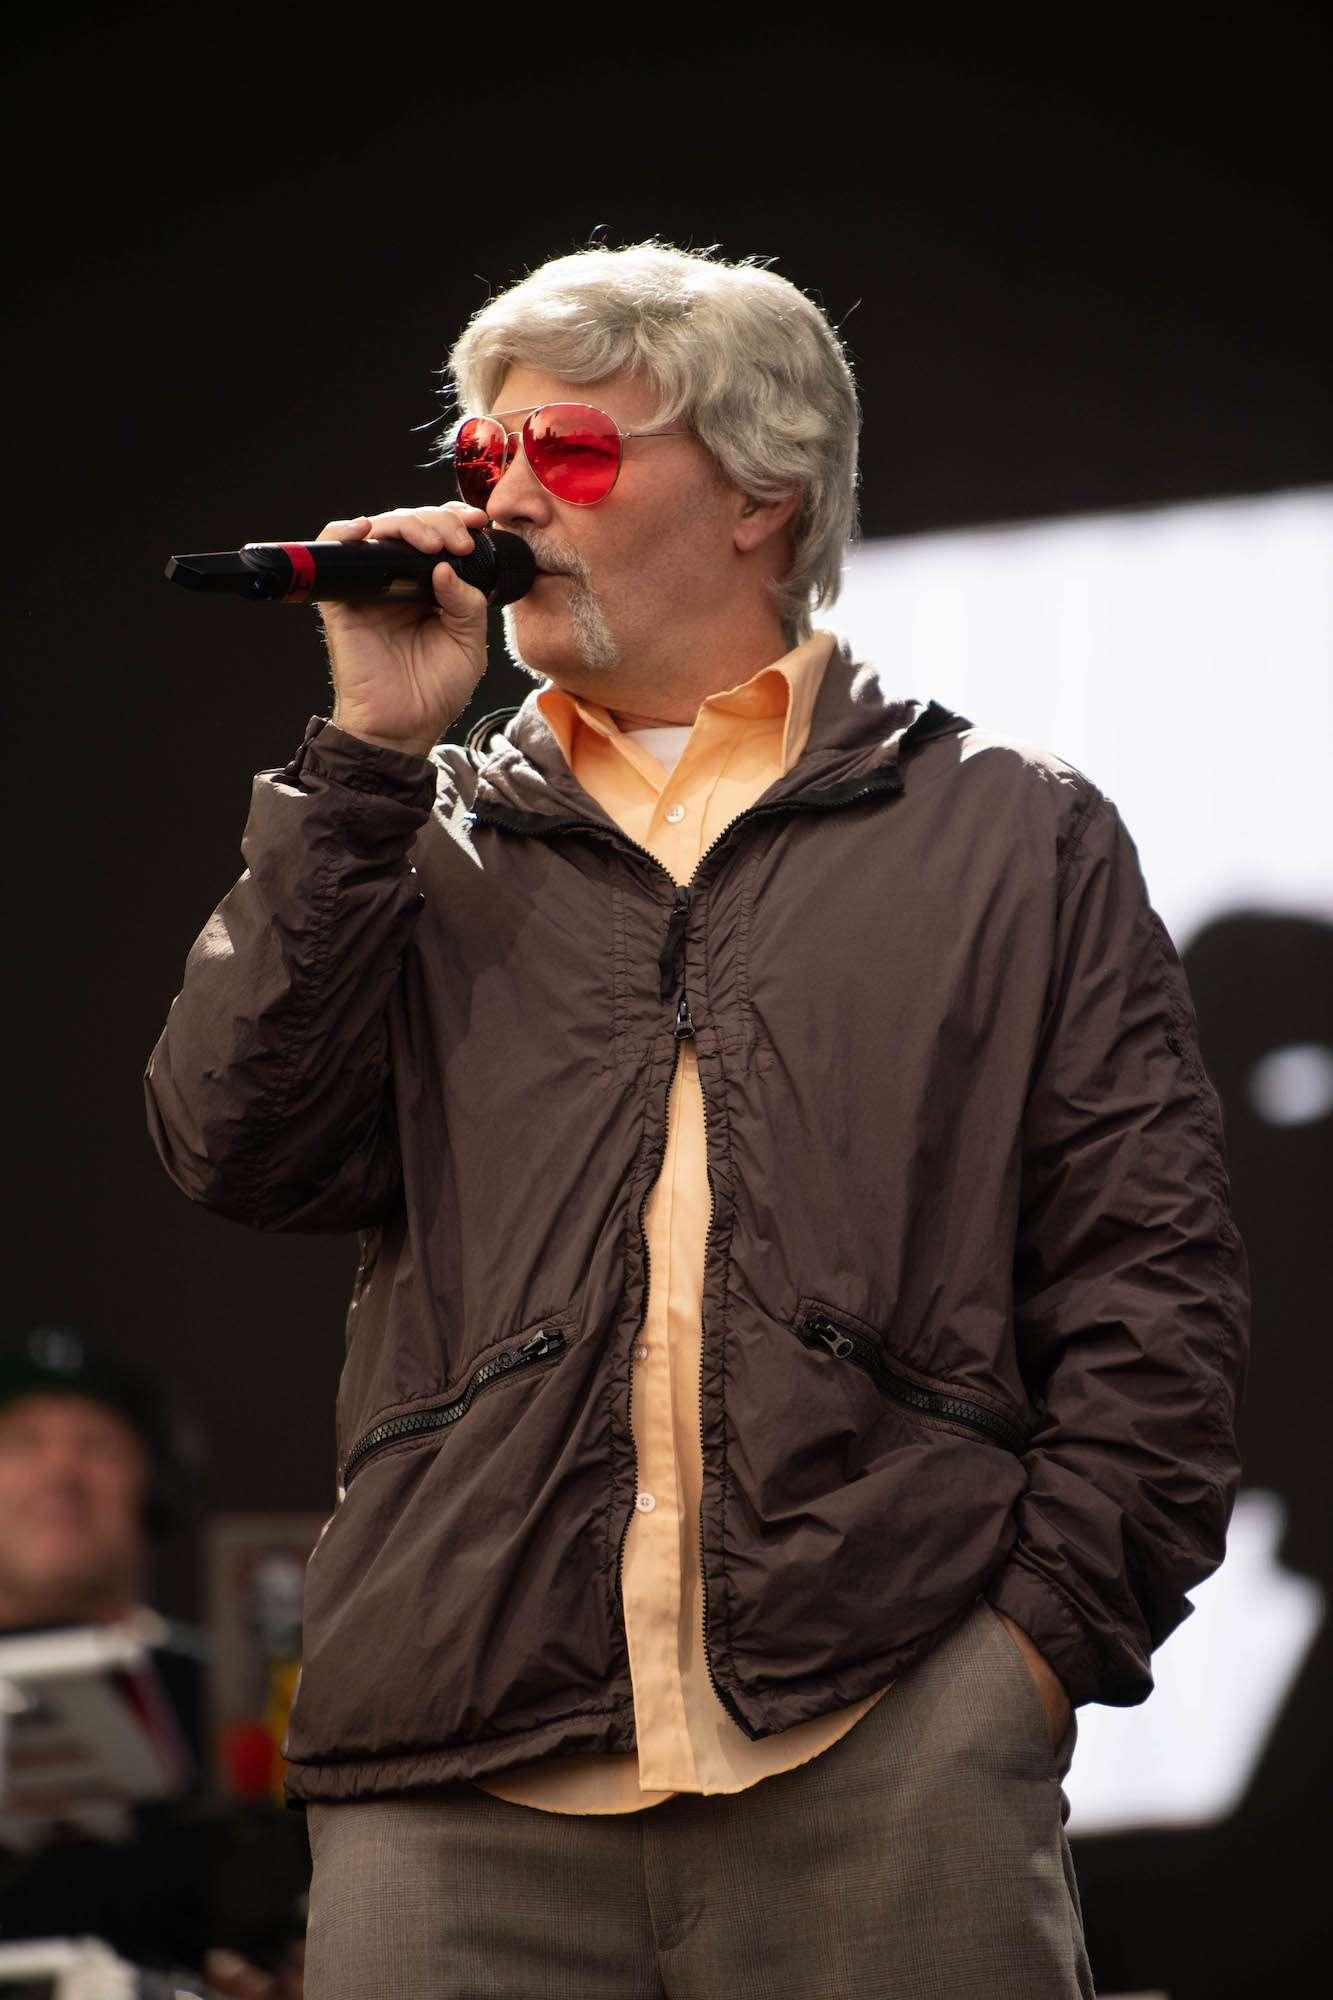 Limp Bizkit Live at Lollapalooza [GALLERY] 8